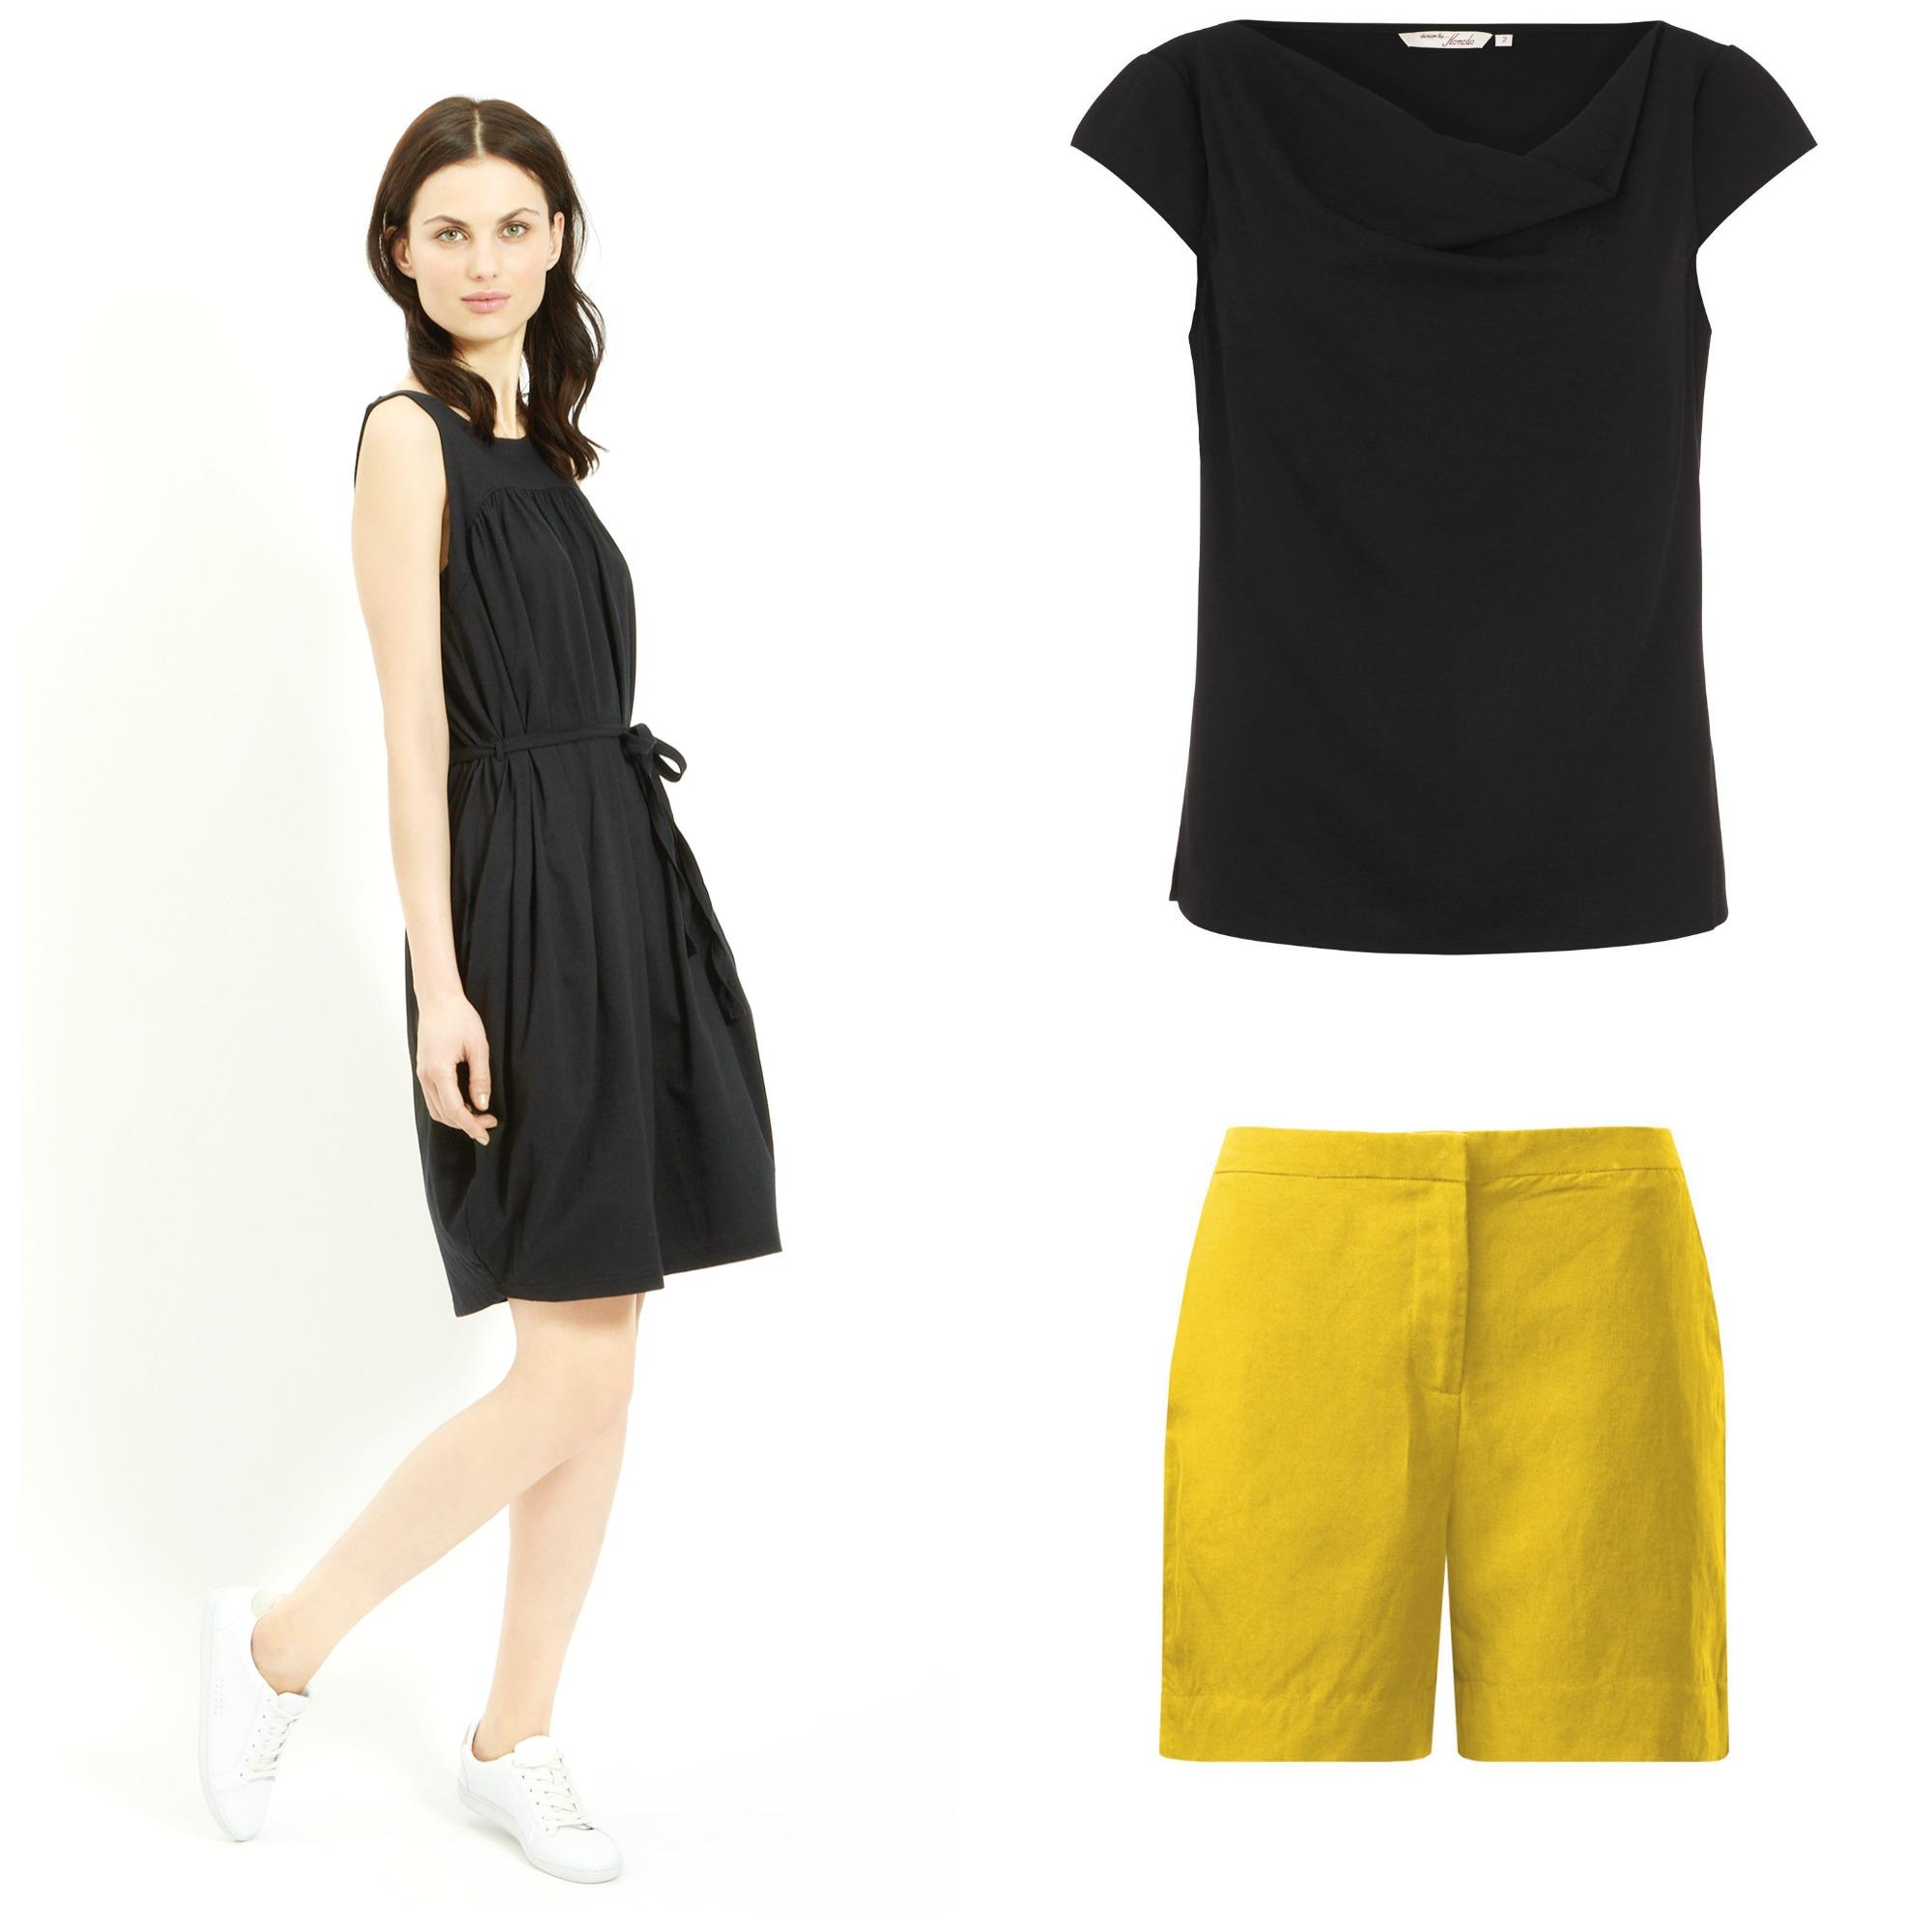 OLOL July Style Edit Clothing